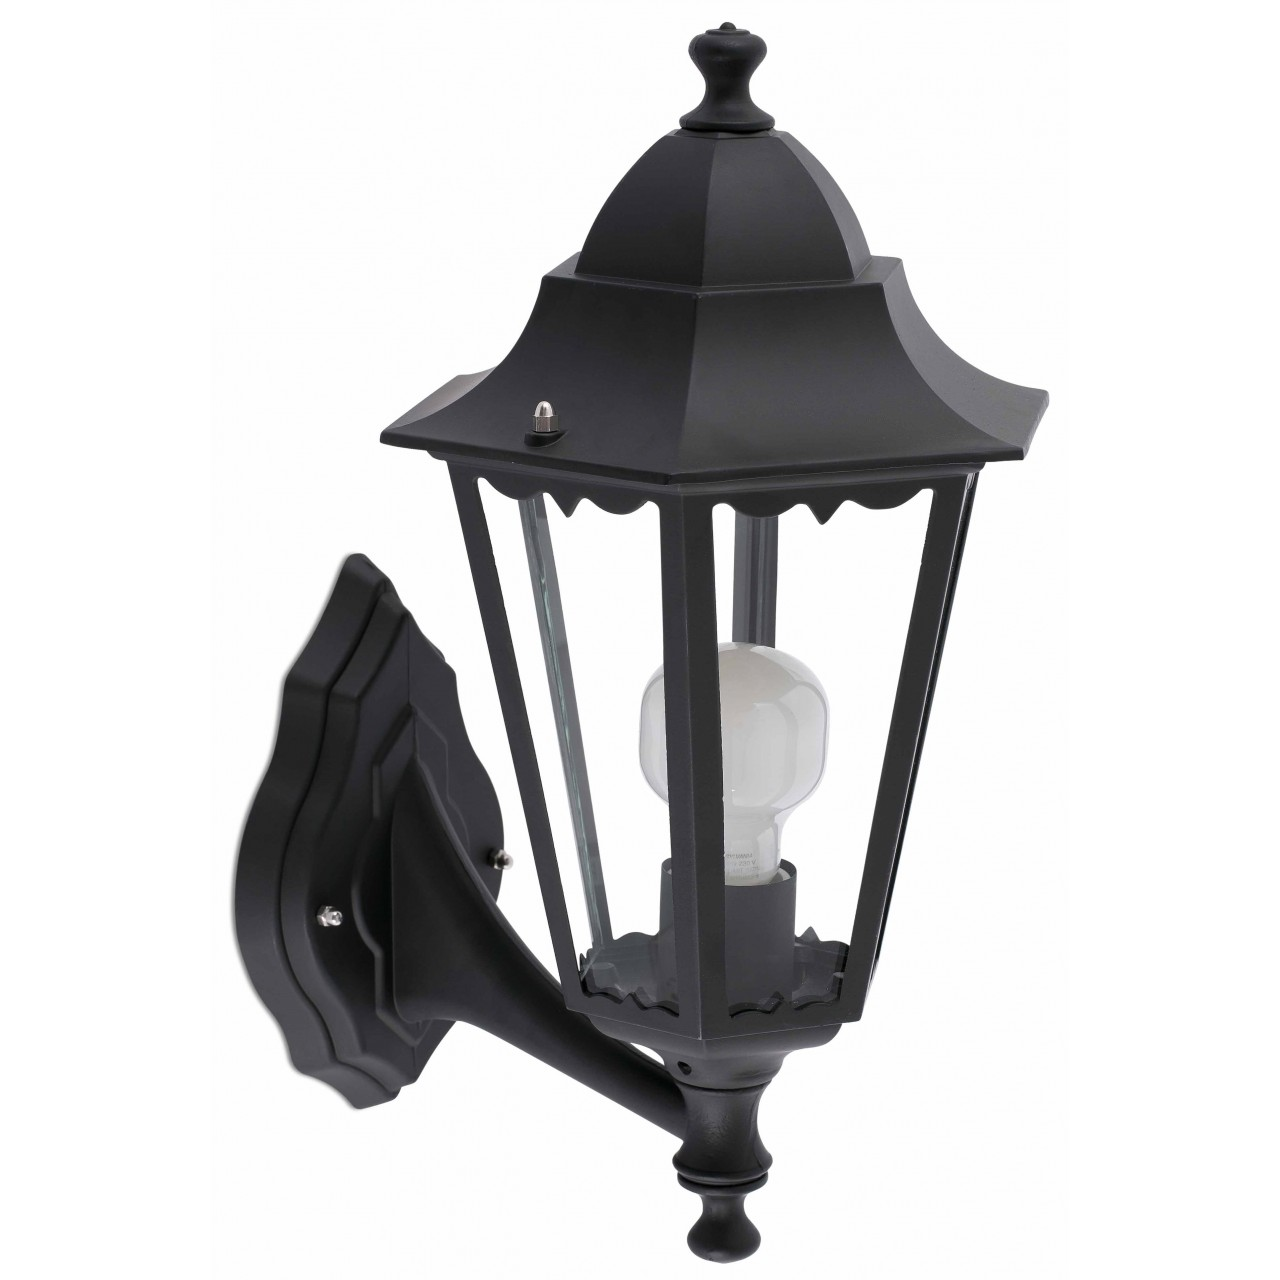 VIENA Black wall lamp